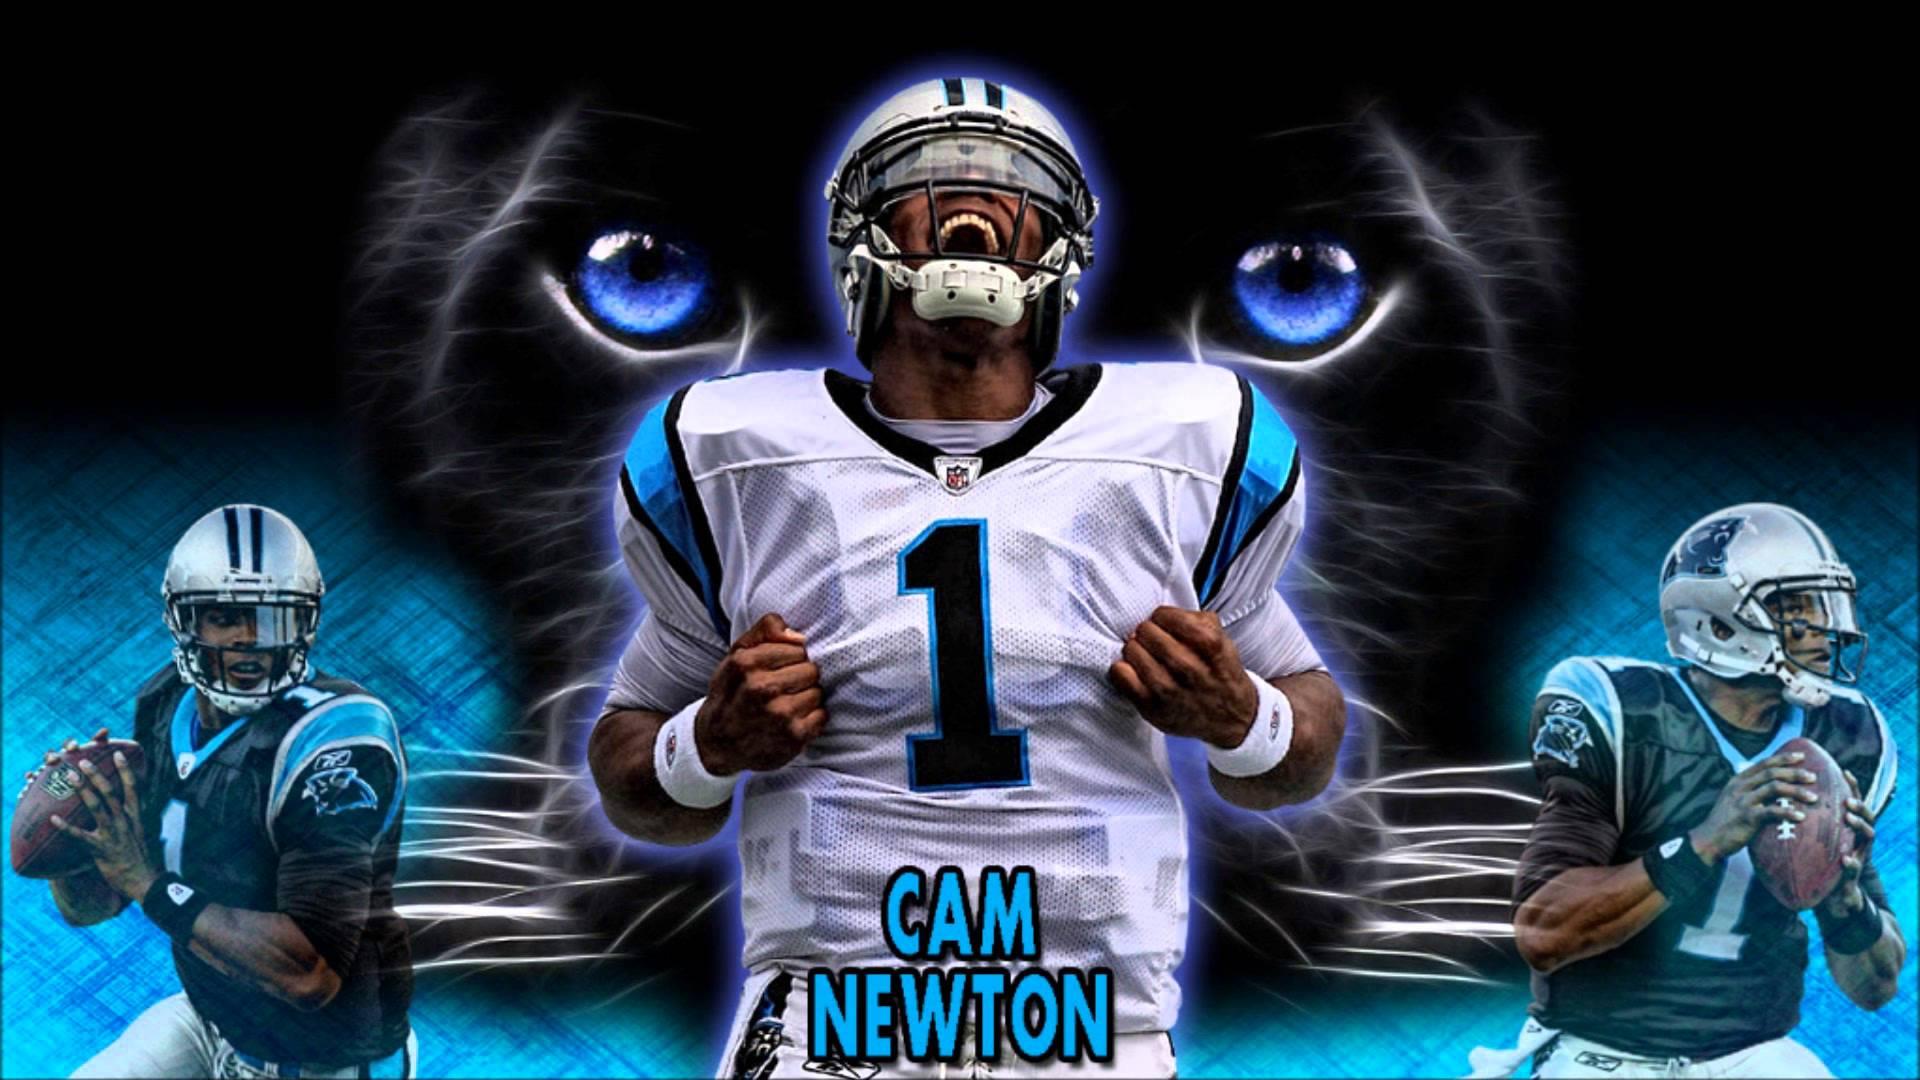 cam newton dab wallpaper hd